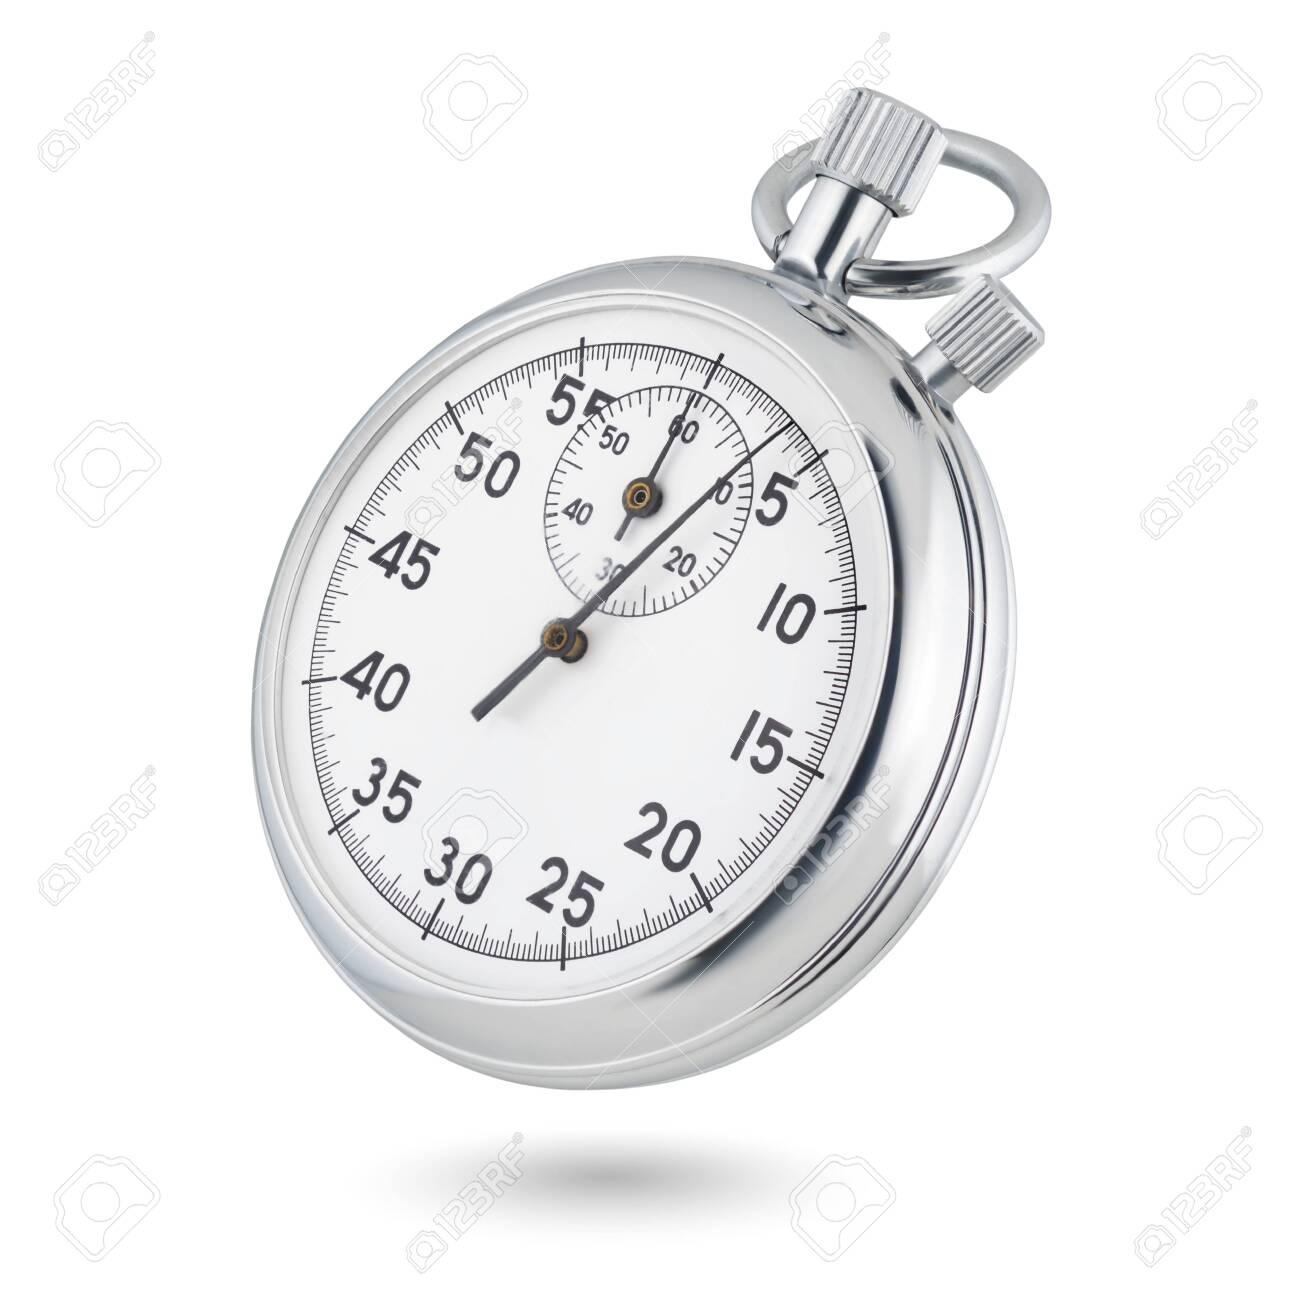 Classic metallic chrome mechanical analog stopwatch isolated on white background. - 137066256